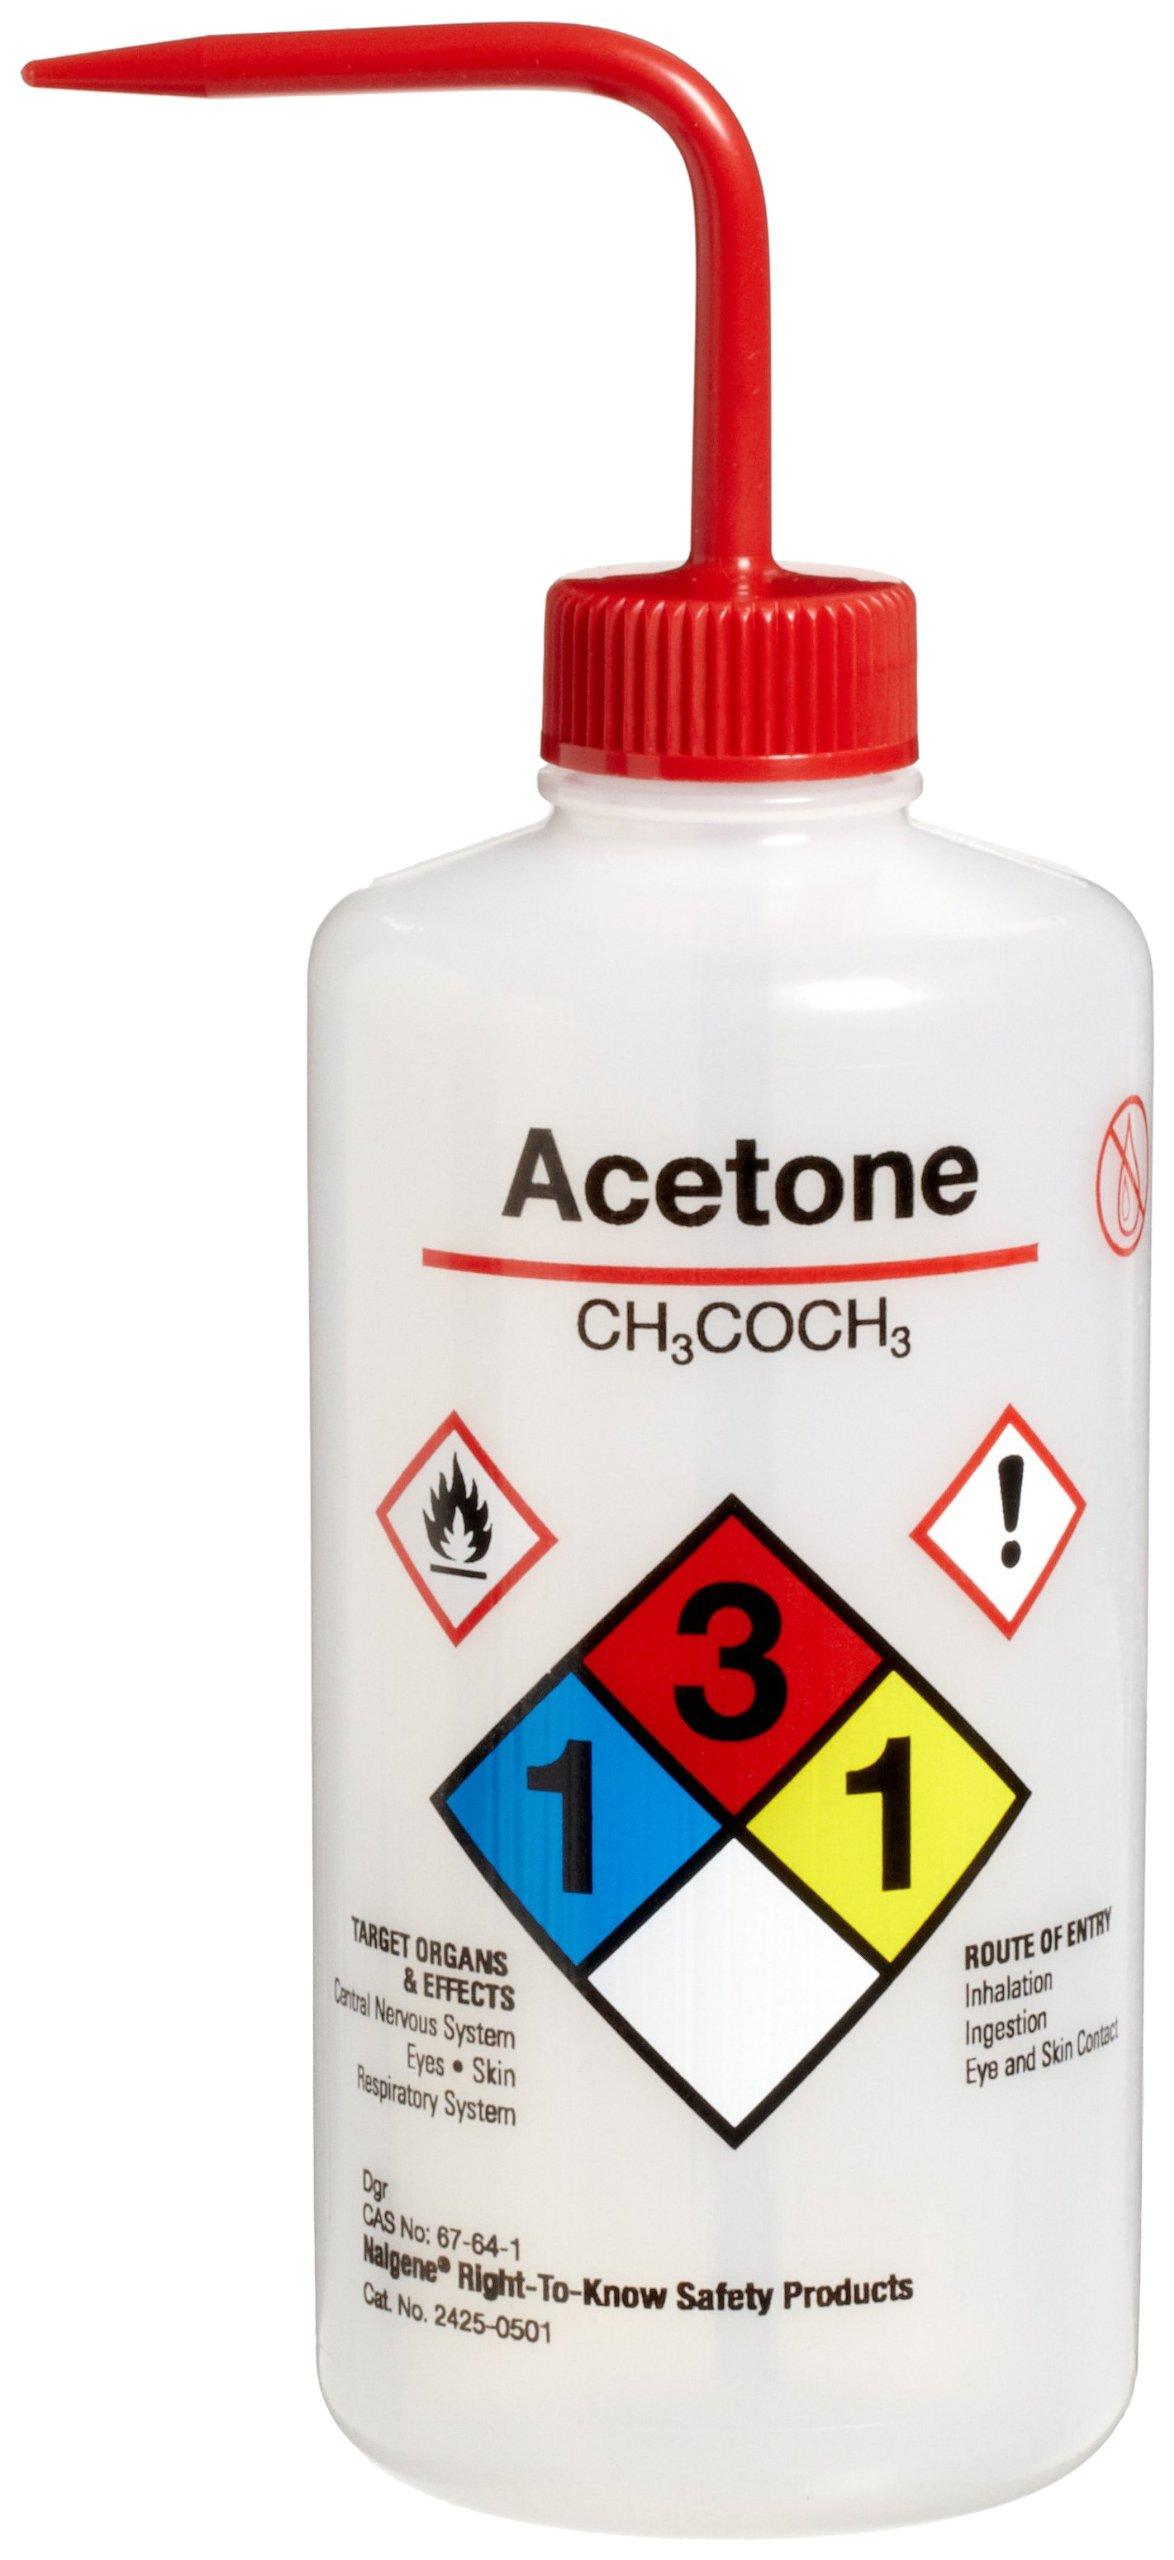 Nalgene 2425-0501 LDPE Right-To-Know Acetone Safety Wash Bottle, 500mL Capacity, 28mm Polypropylene Closure (Pack of 6)